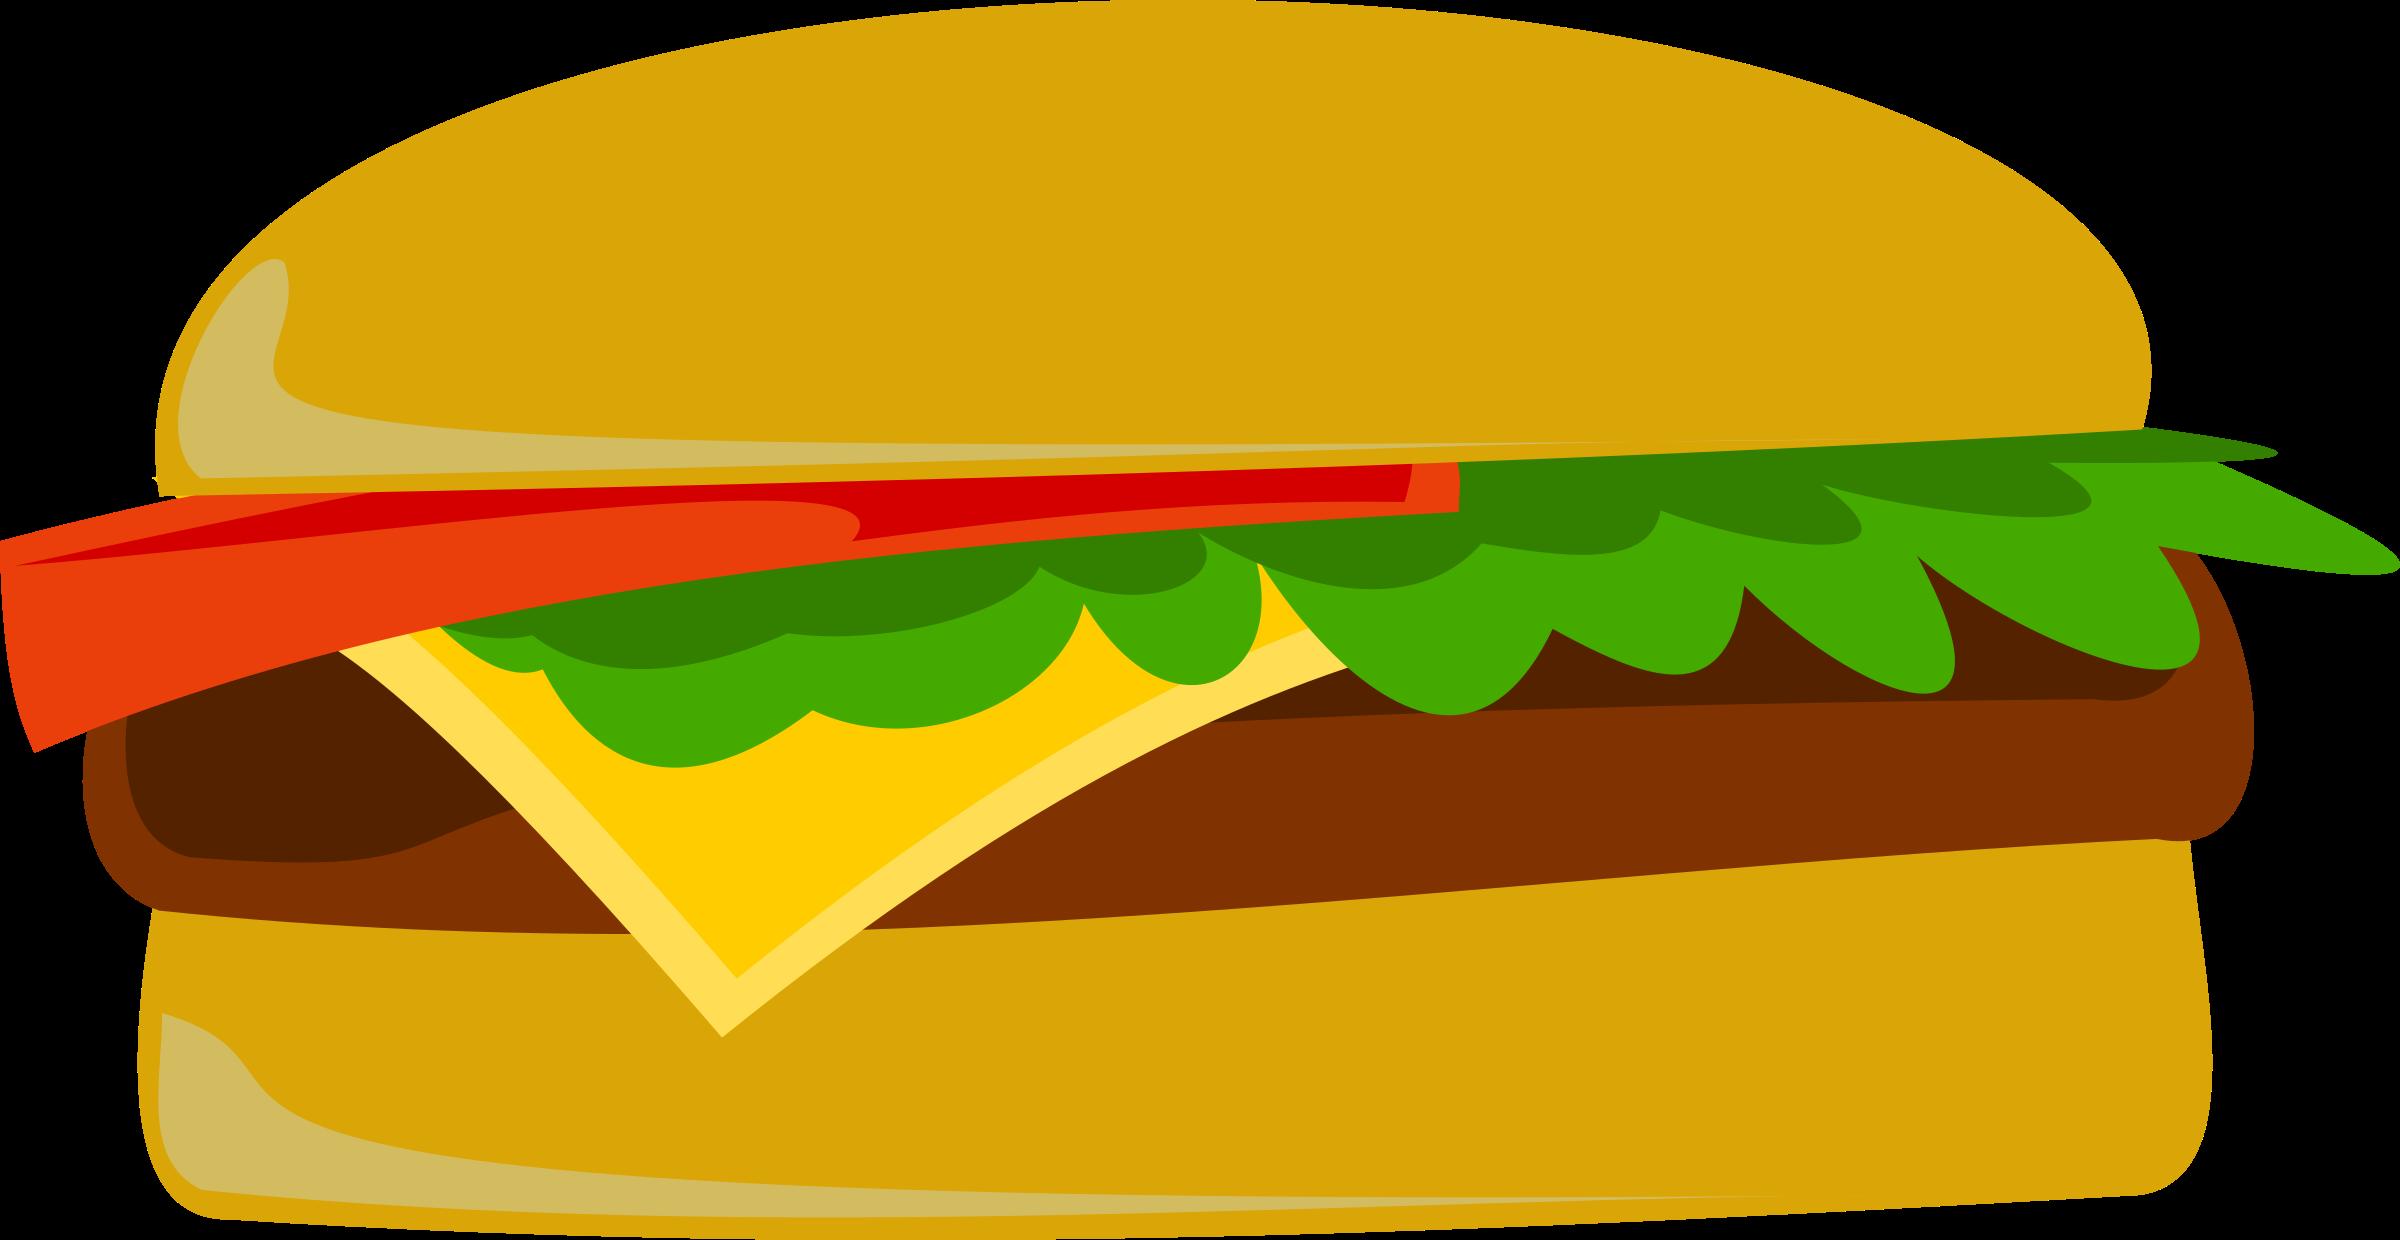 Burger clipart beef burger Cheese Burger Clipart Cheese Burger